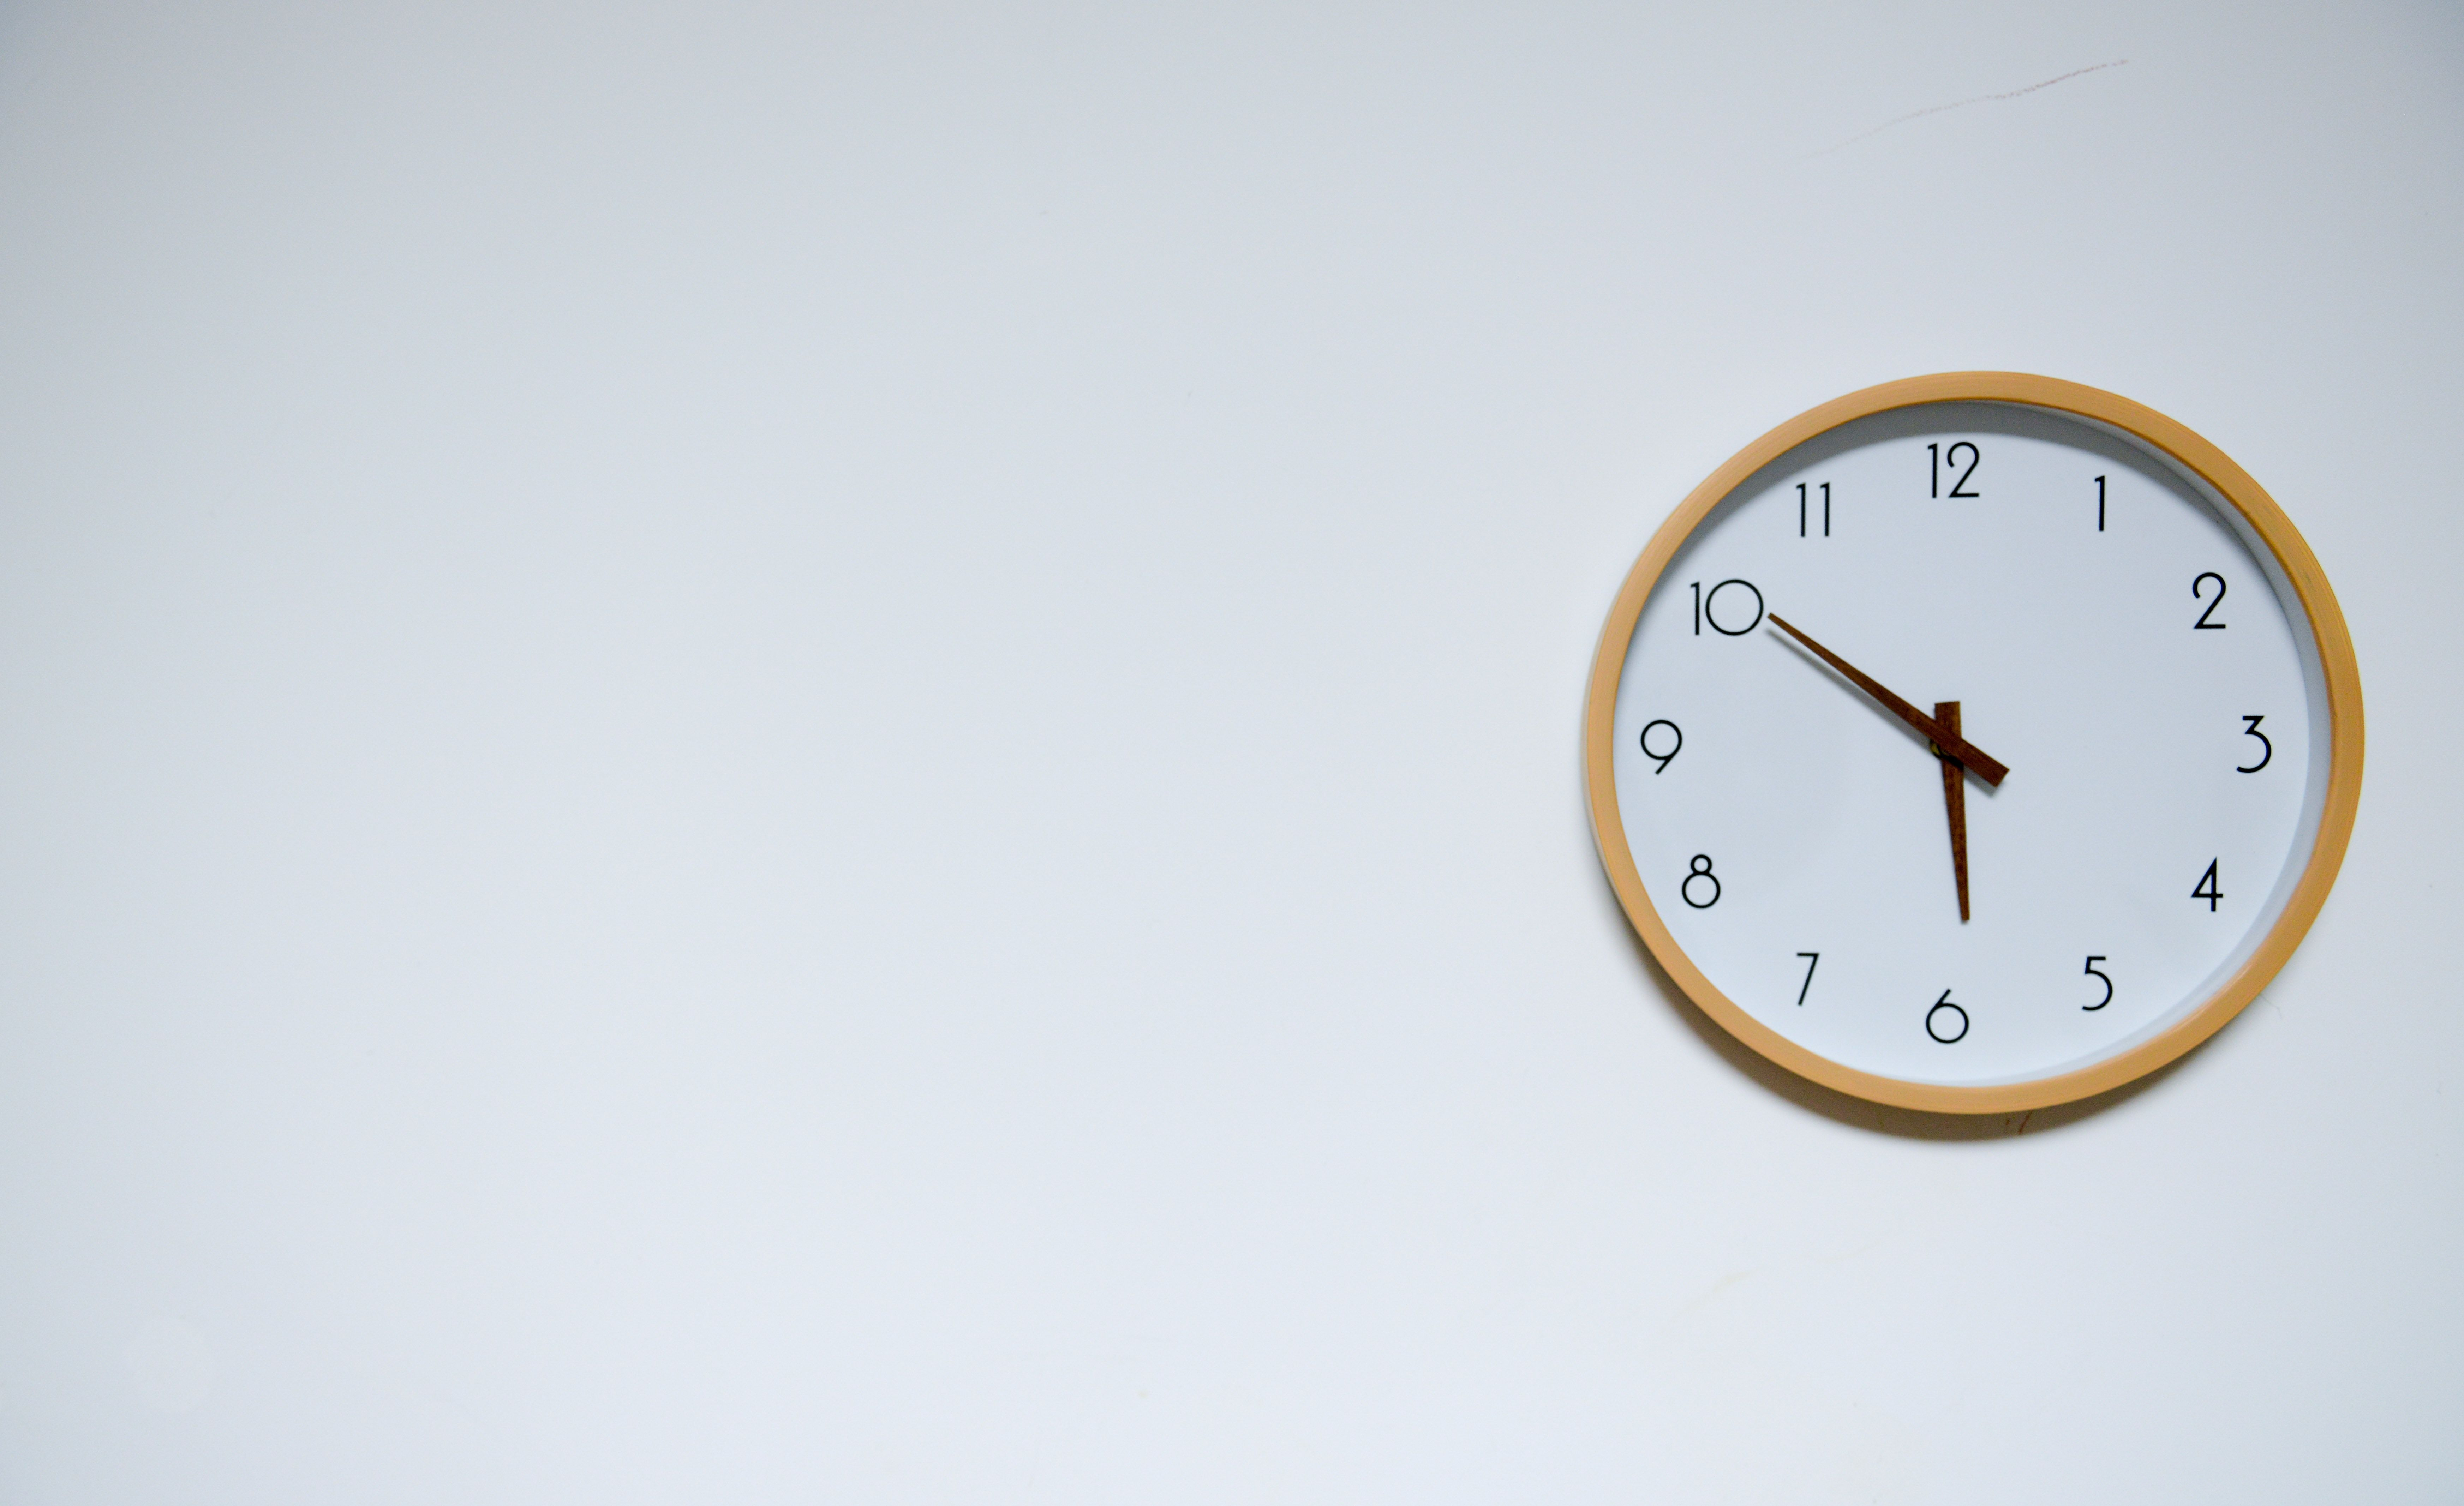 ISME Training time management